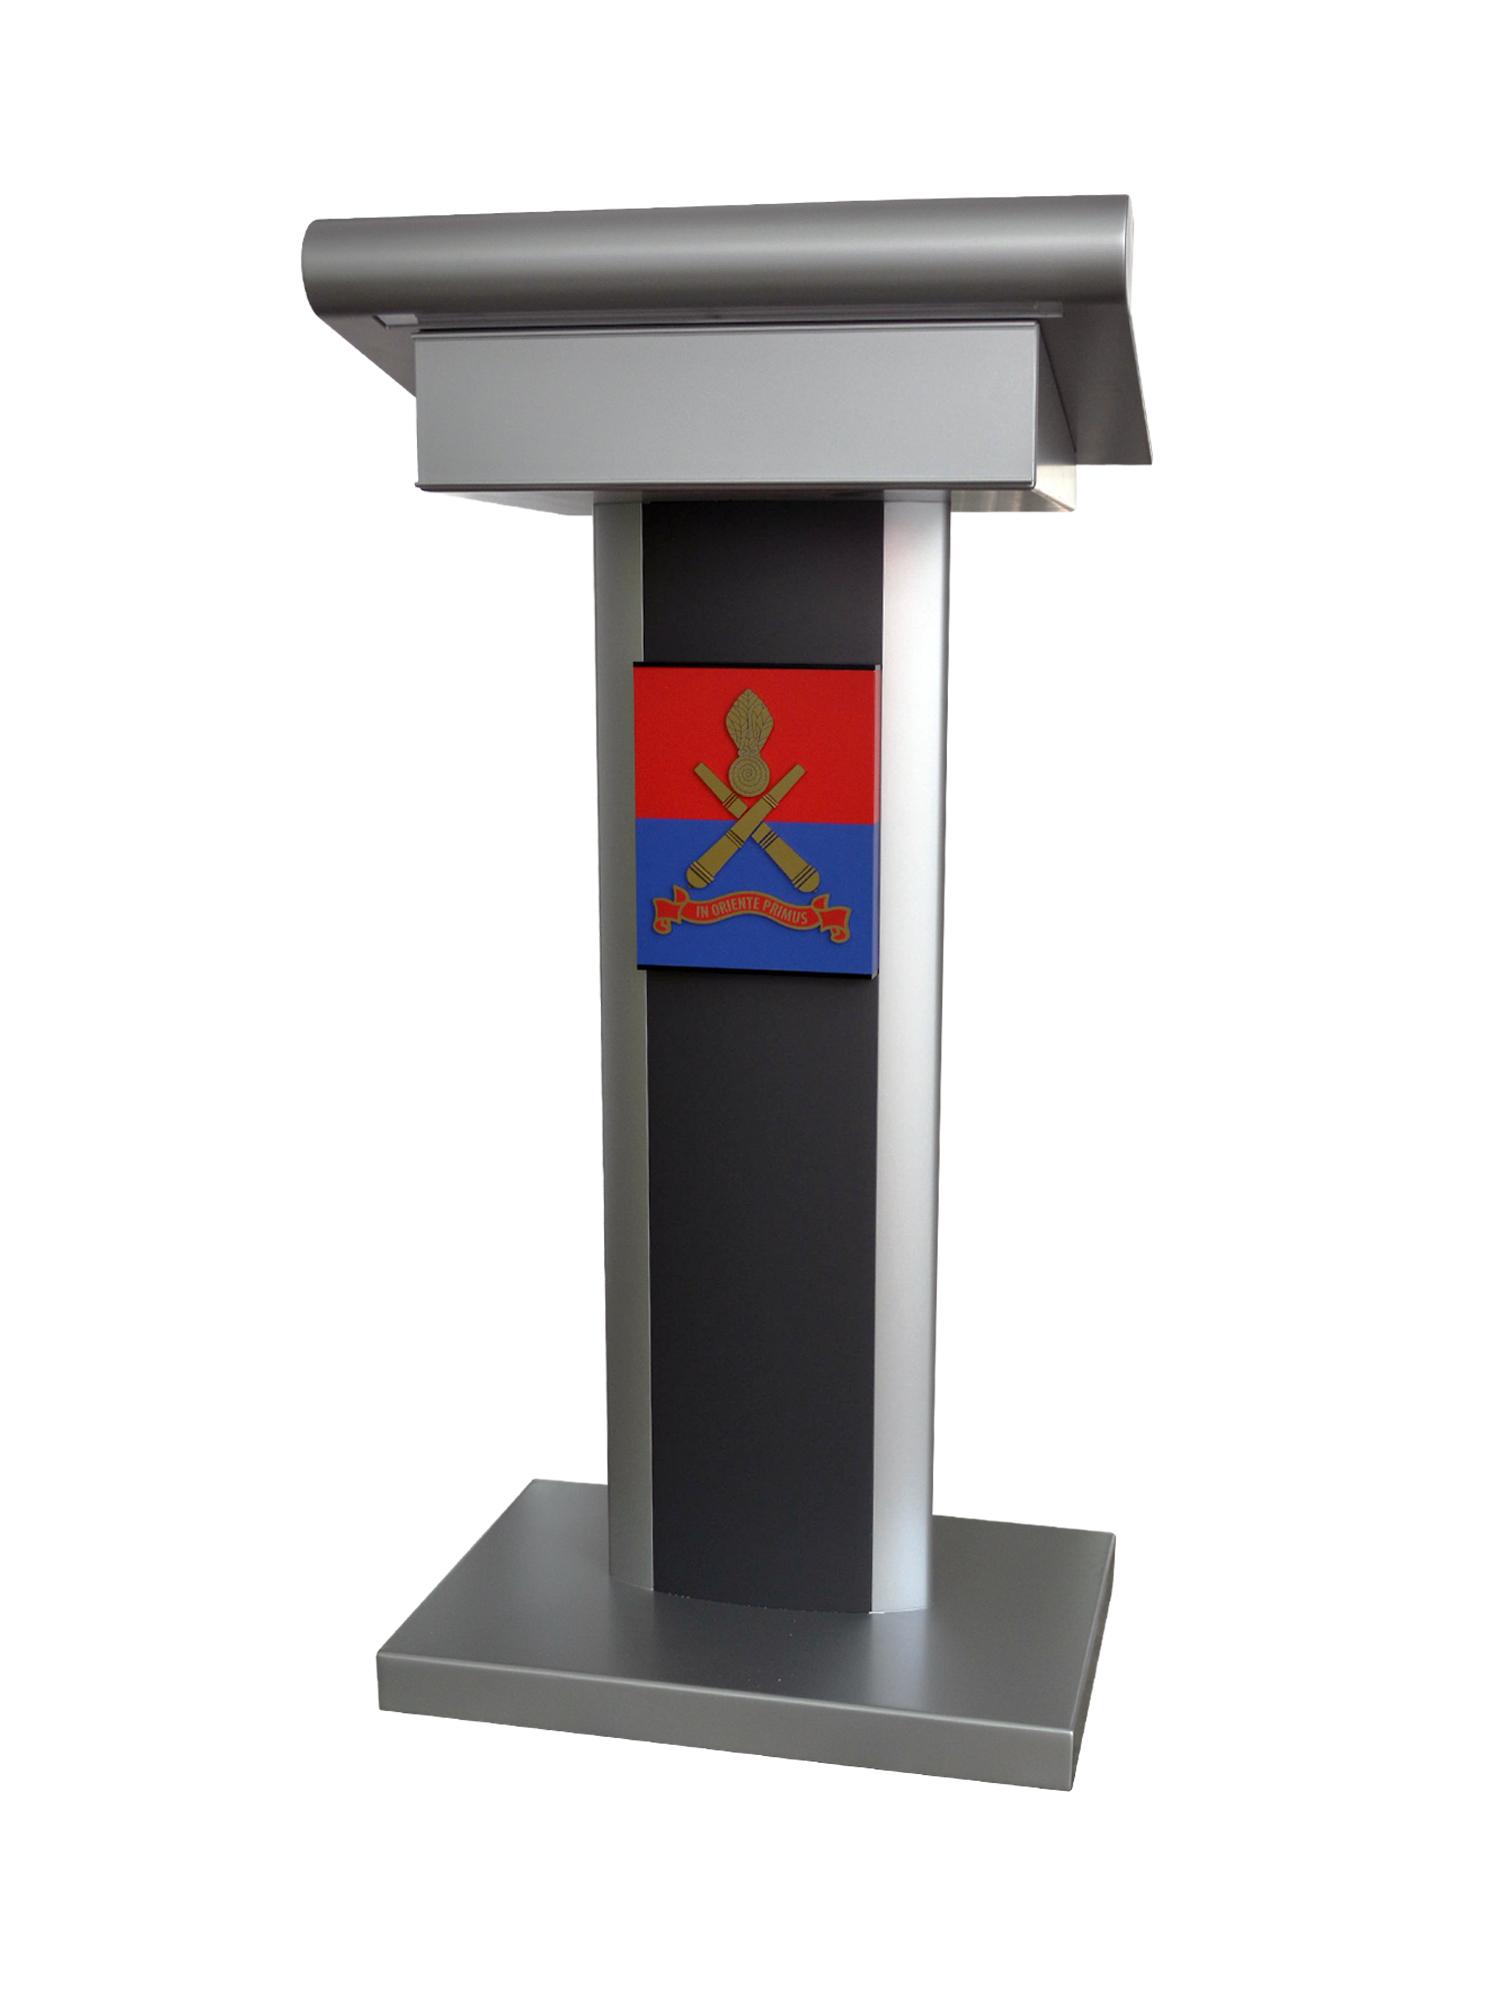 SAF - The Singapore Artillery